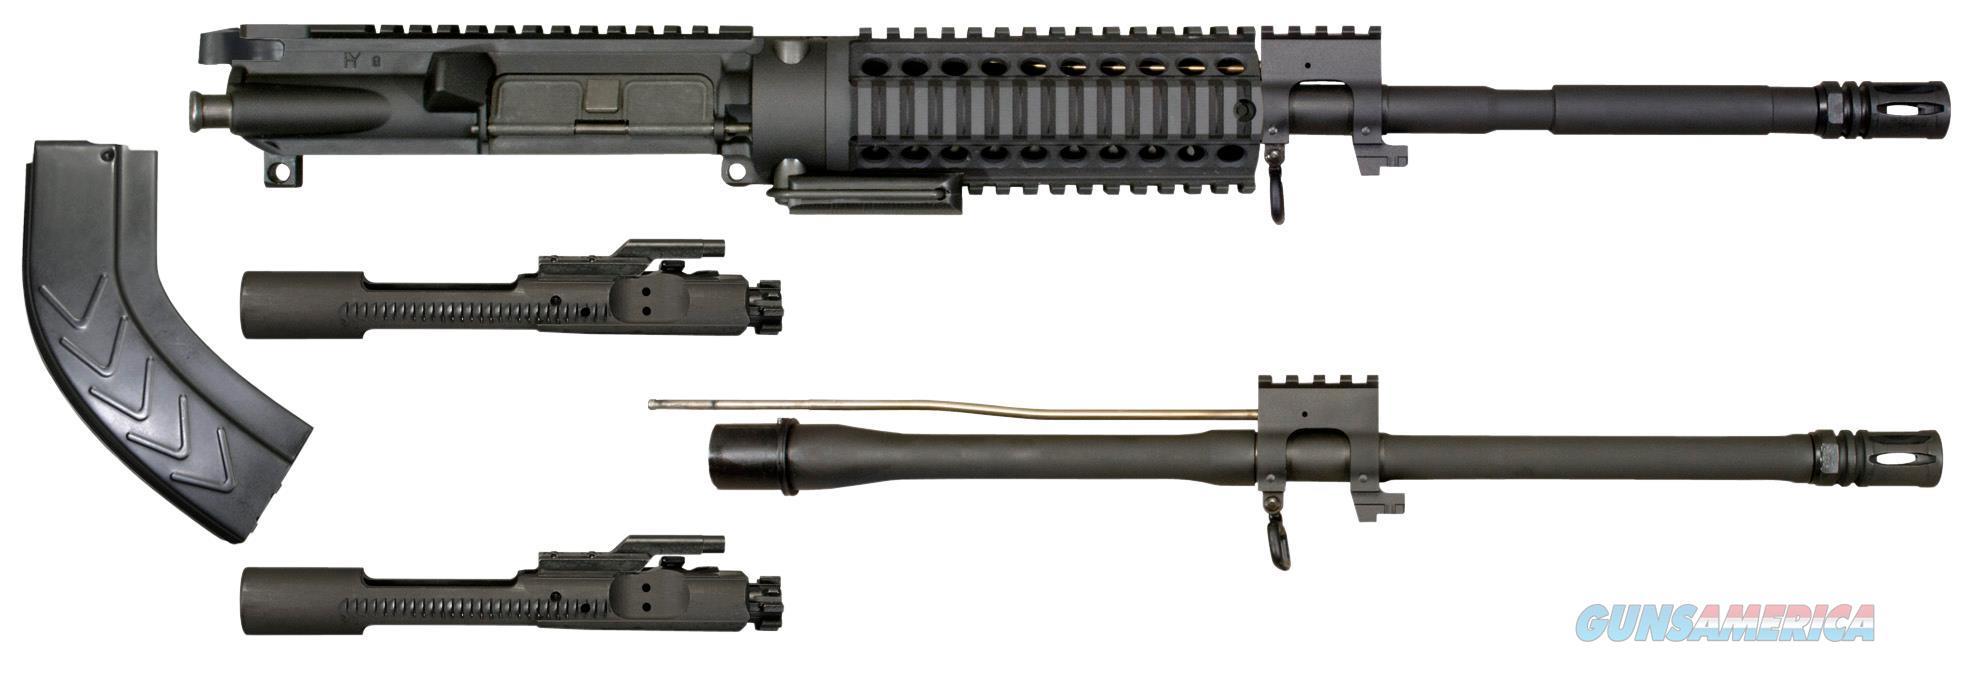 "Windham Weaponry Kitmcs2 Multi-Caliber Upper Kit 223 Remington/7.62X39mm 16"" Blk KITMCS2  Non-Guns > Gun Parts > M16-AR15 > Upper Only"